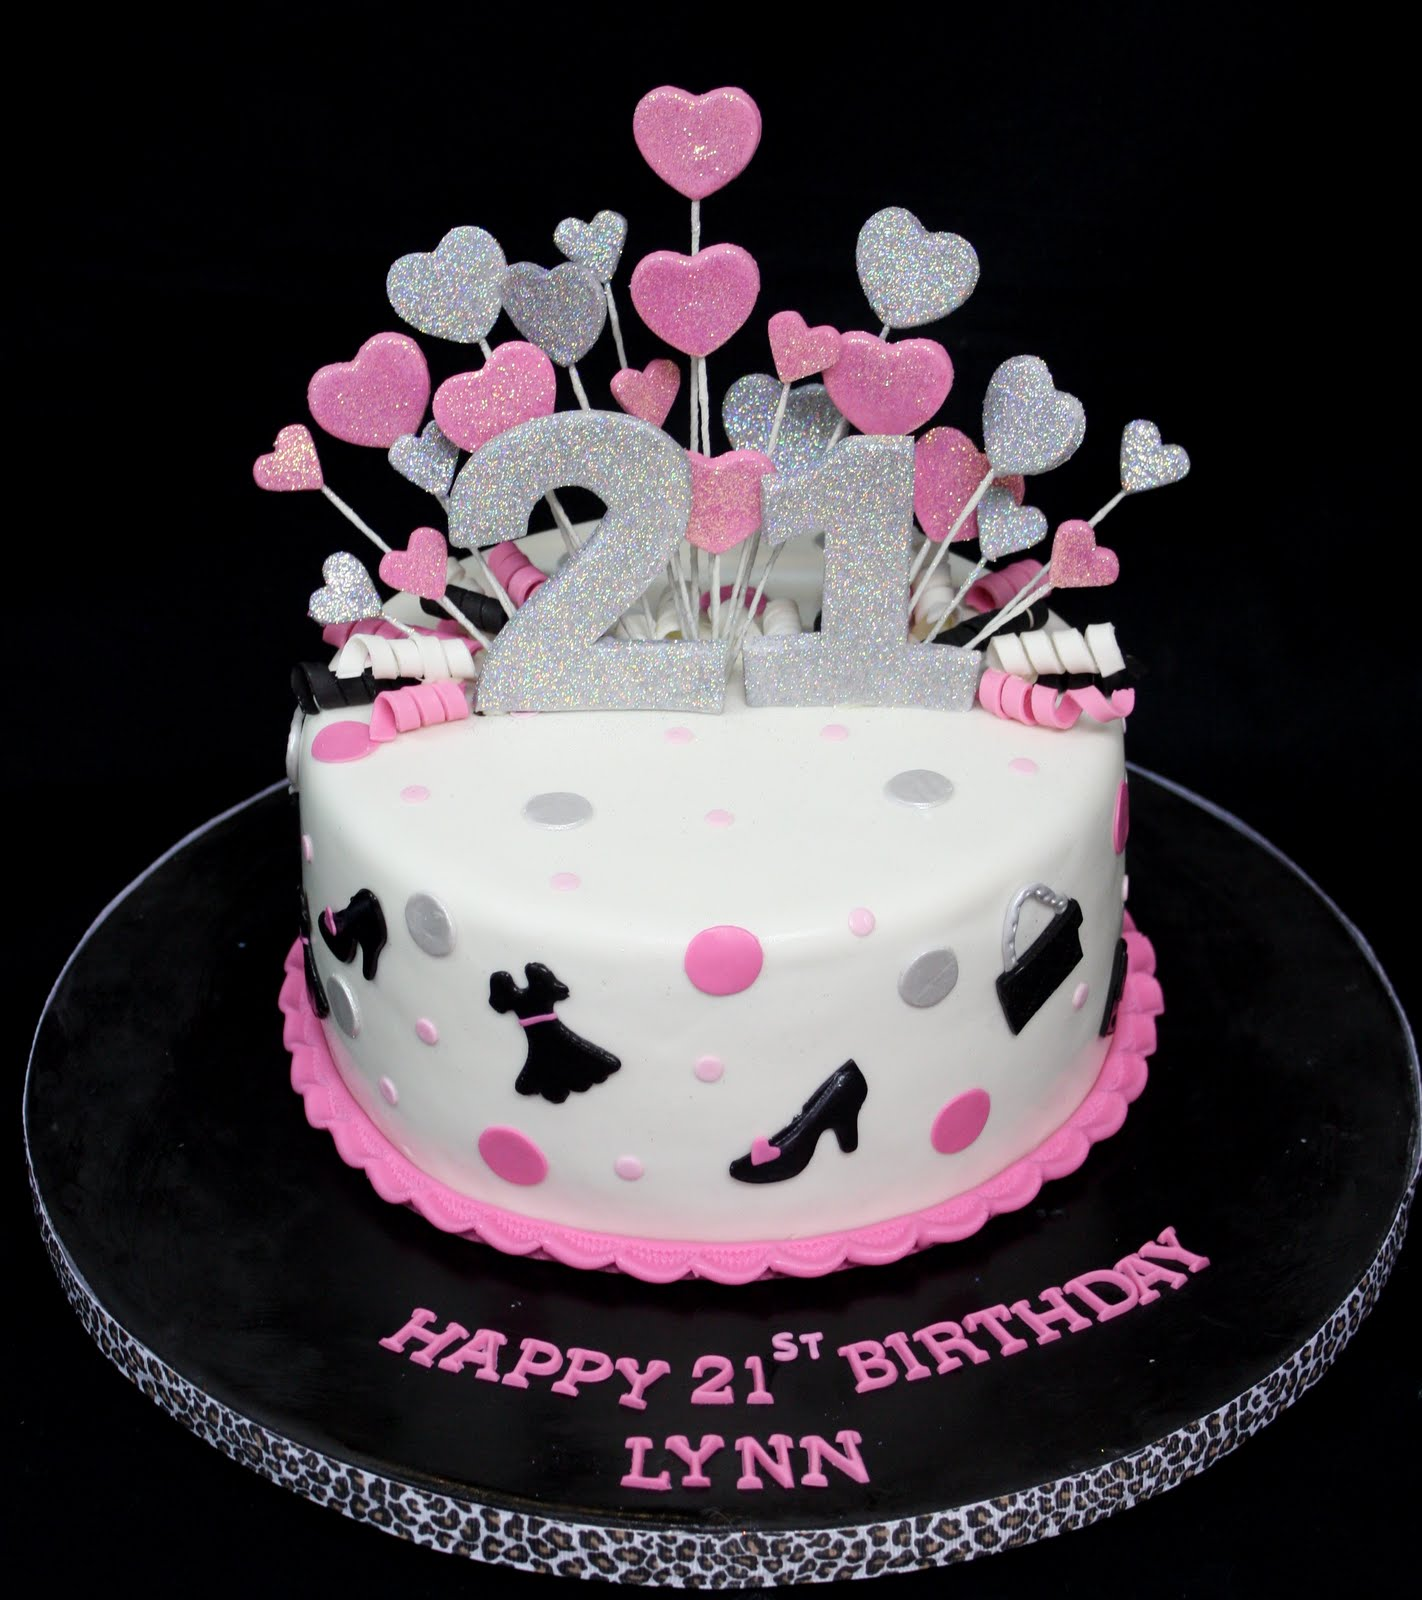 Cake Designs For 21st Birthday For A Girl : Complete Deelite: Fashion Glitter 21st Birthday Cake!